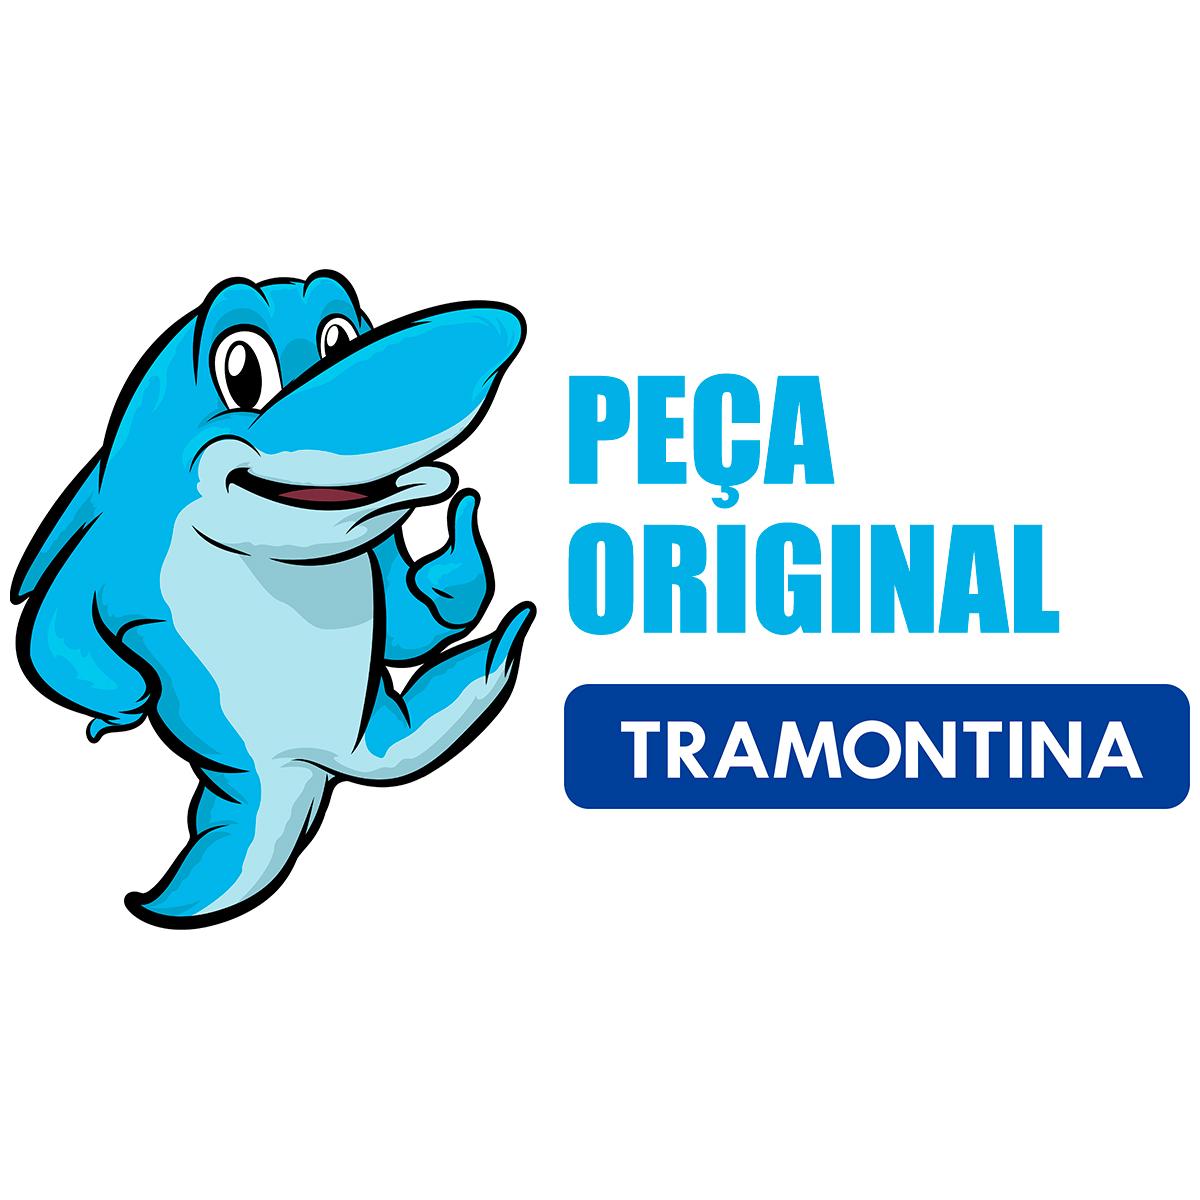 Kit Válvulas de entrada para Lavadora Tramontina 2100psi 2000w Original 03pcs